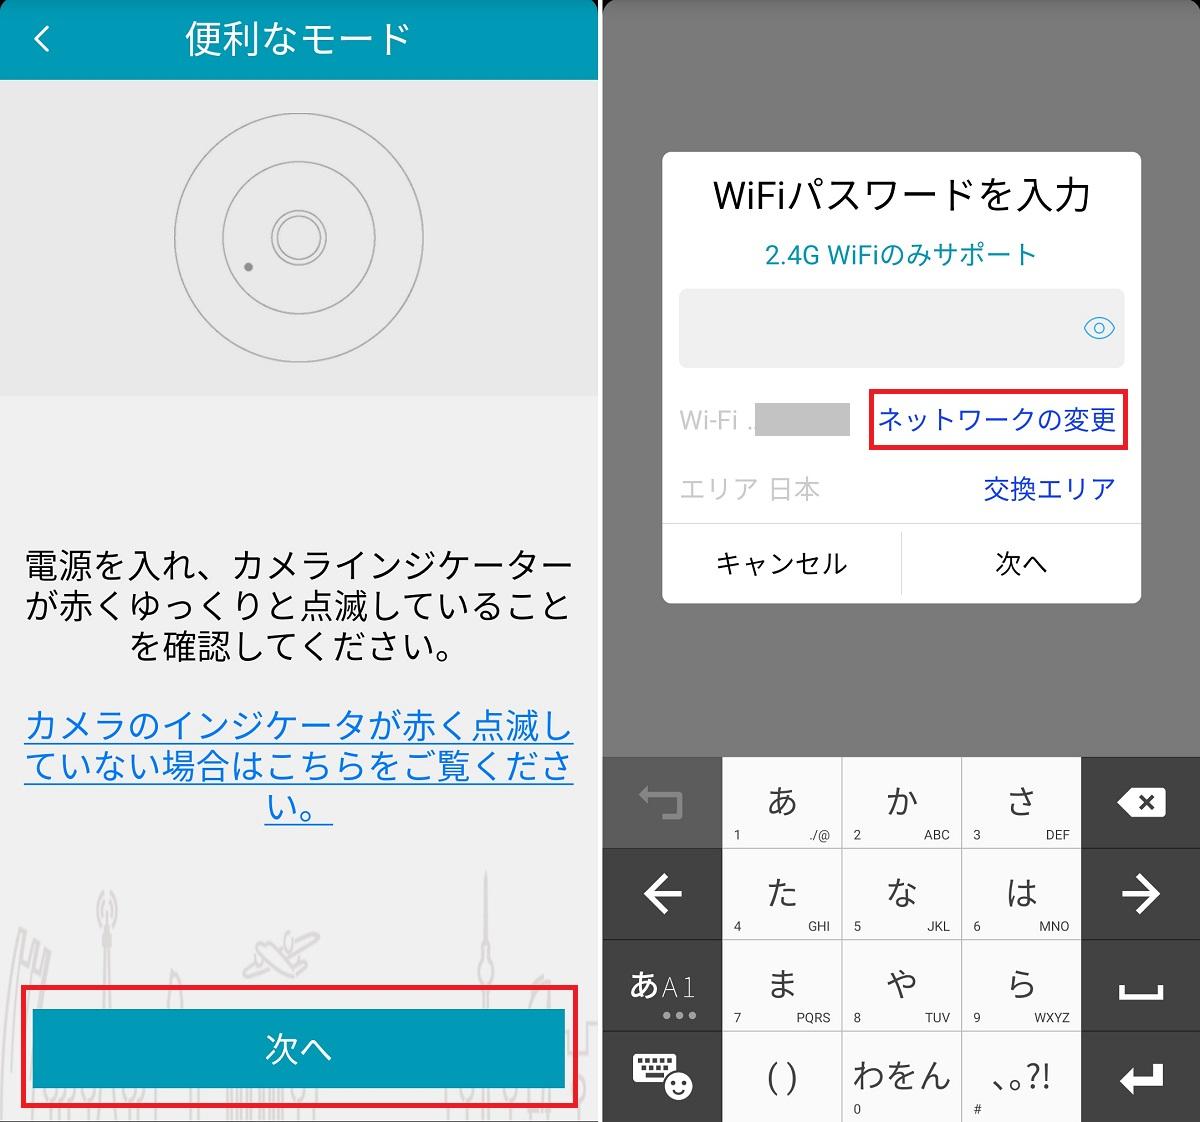 Wi-Fi接続先を変更する